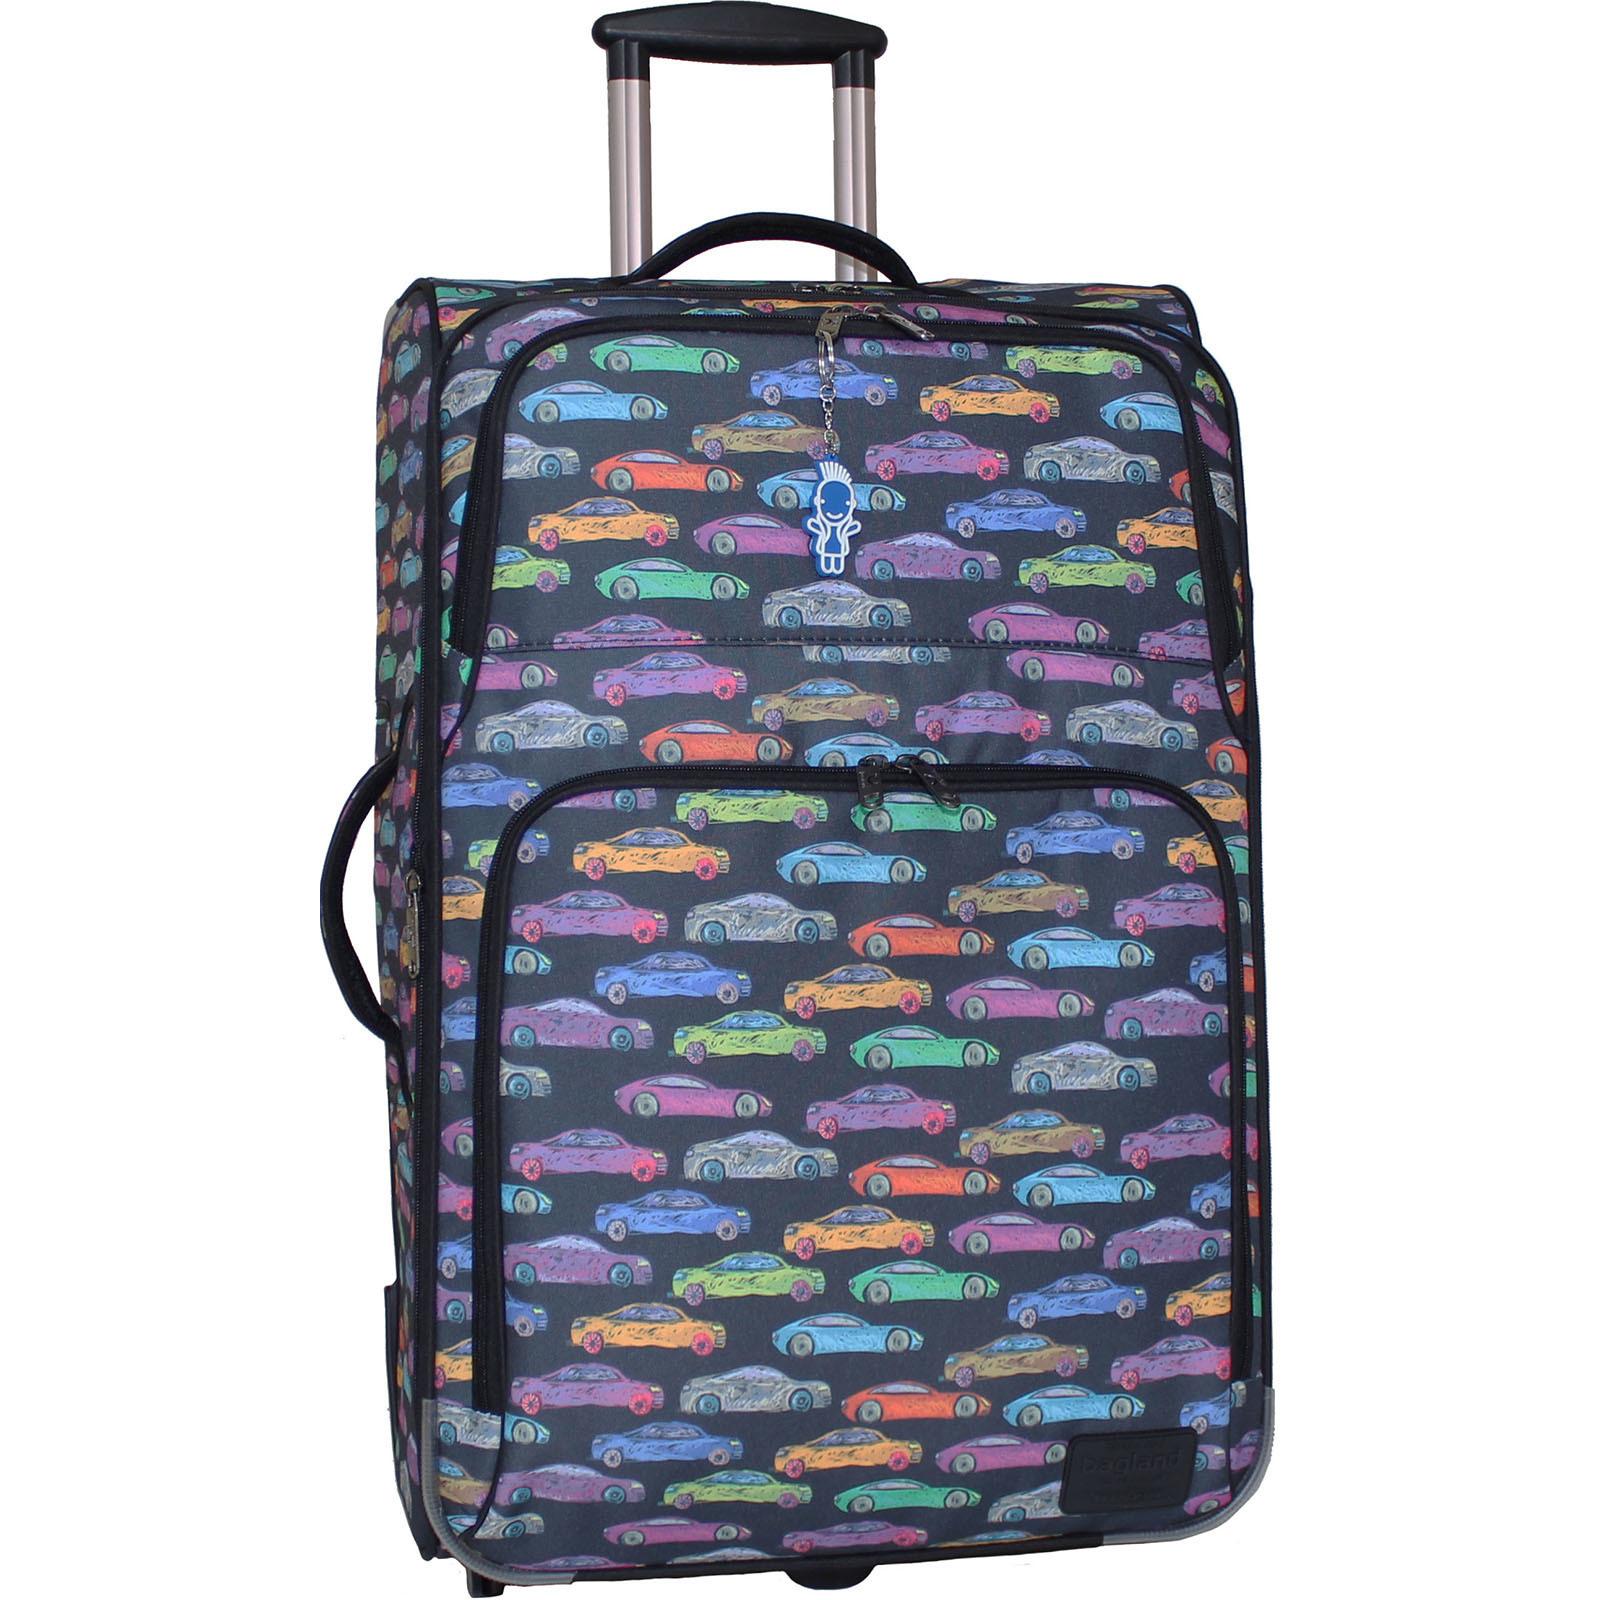 Дорожные чемоданы Чемодан Bagland Леон большой дизайн 70 л. сублімація 157 (0037666274) IMG_9911.JPG